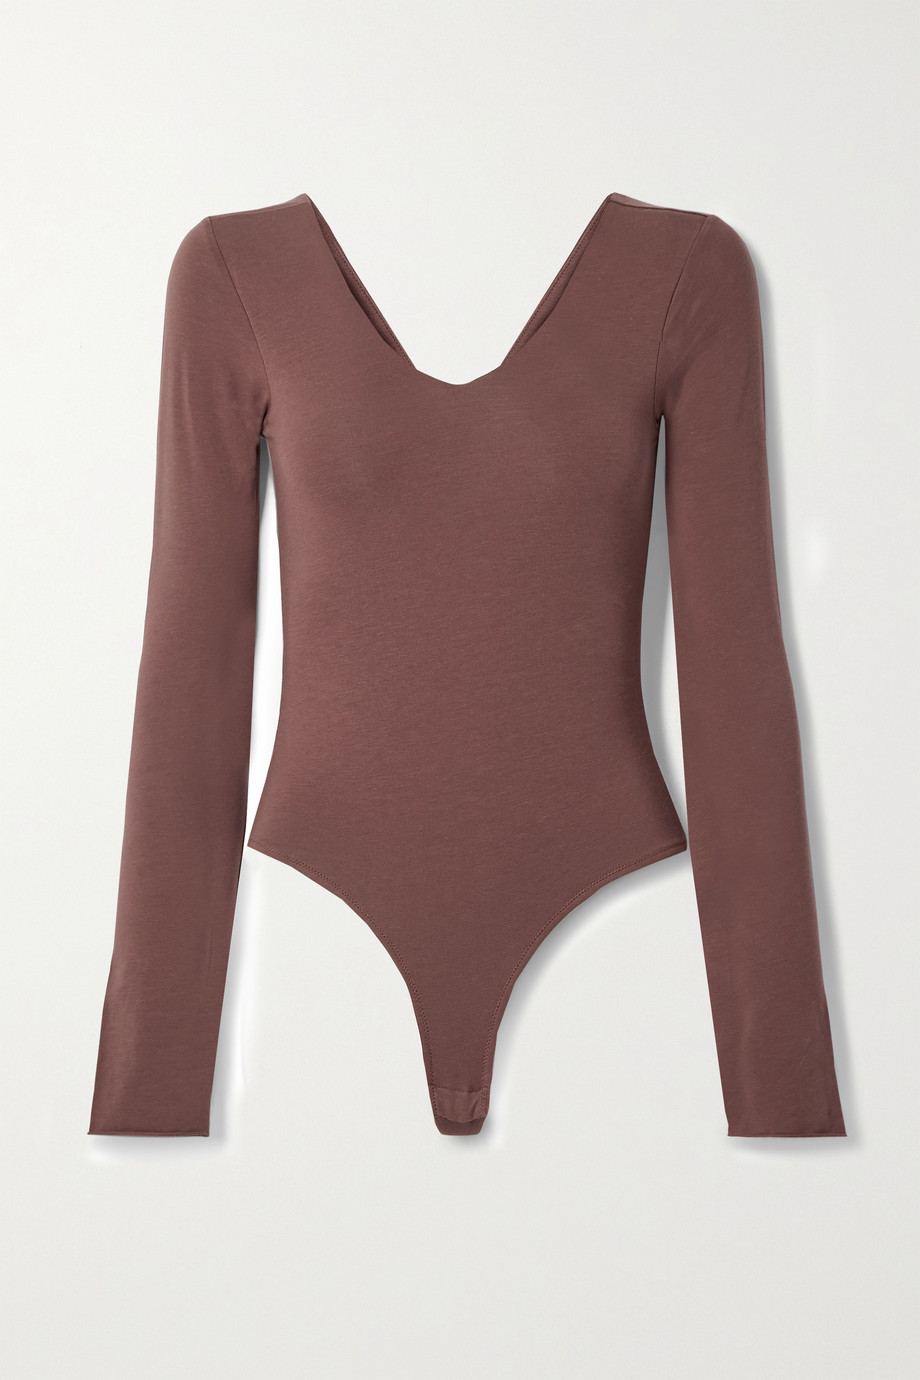 Skin 【NET SUSTAIN】Diana 有机比马棉质平纹布丁字裤式连体紧身衣